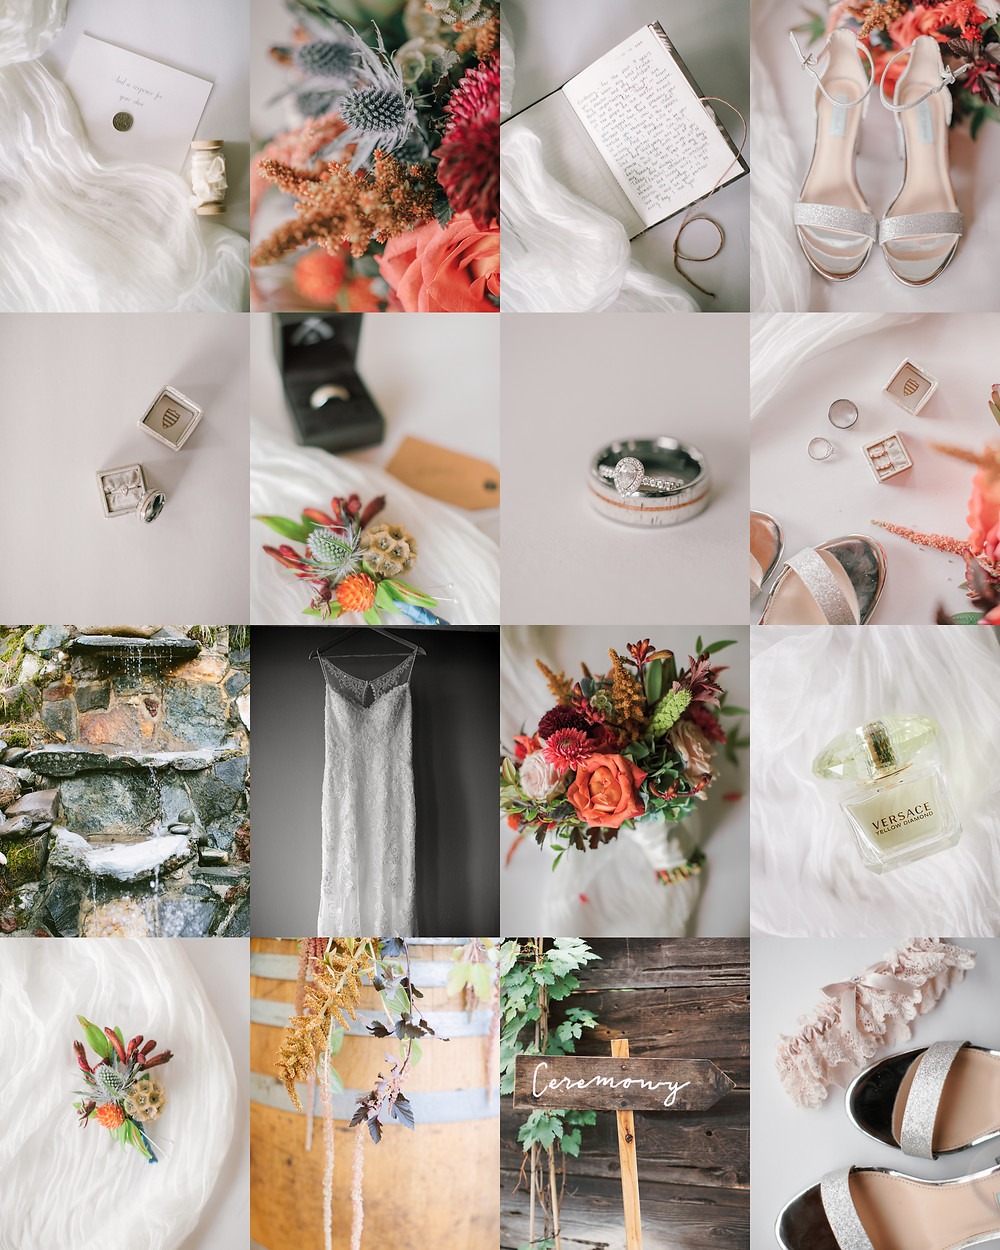 Wedding day details medford oregon